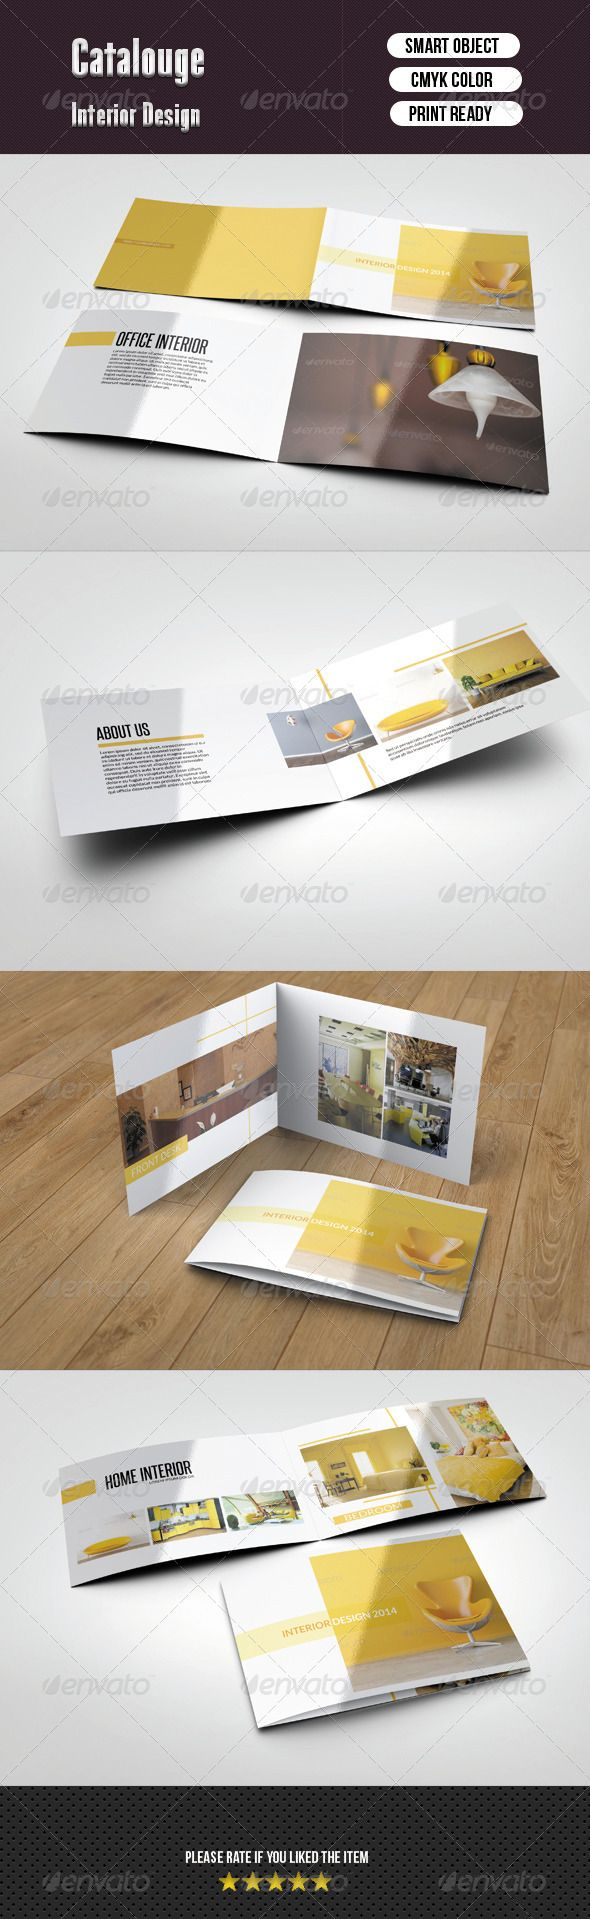 inspiration furniture catalog. Interior Catalog - Catalogs Brochures Inspiration Furniture